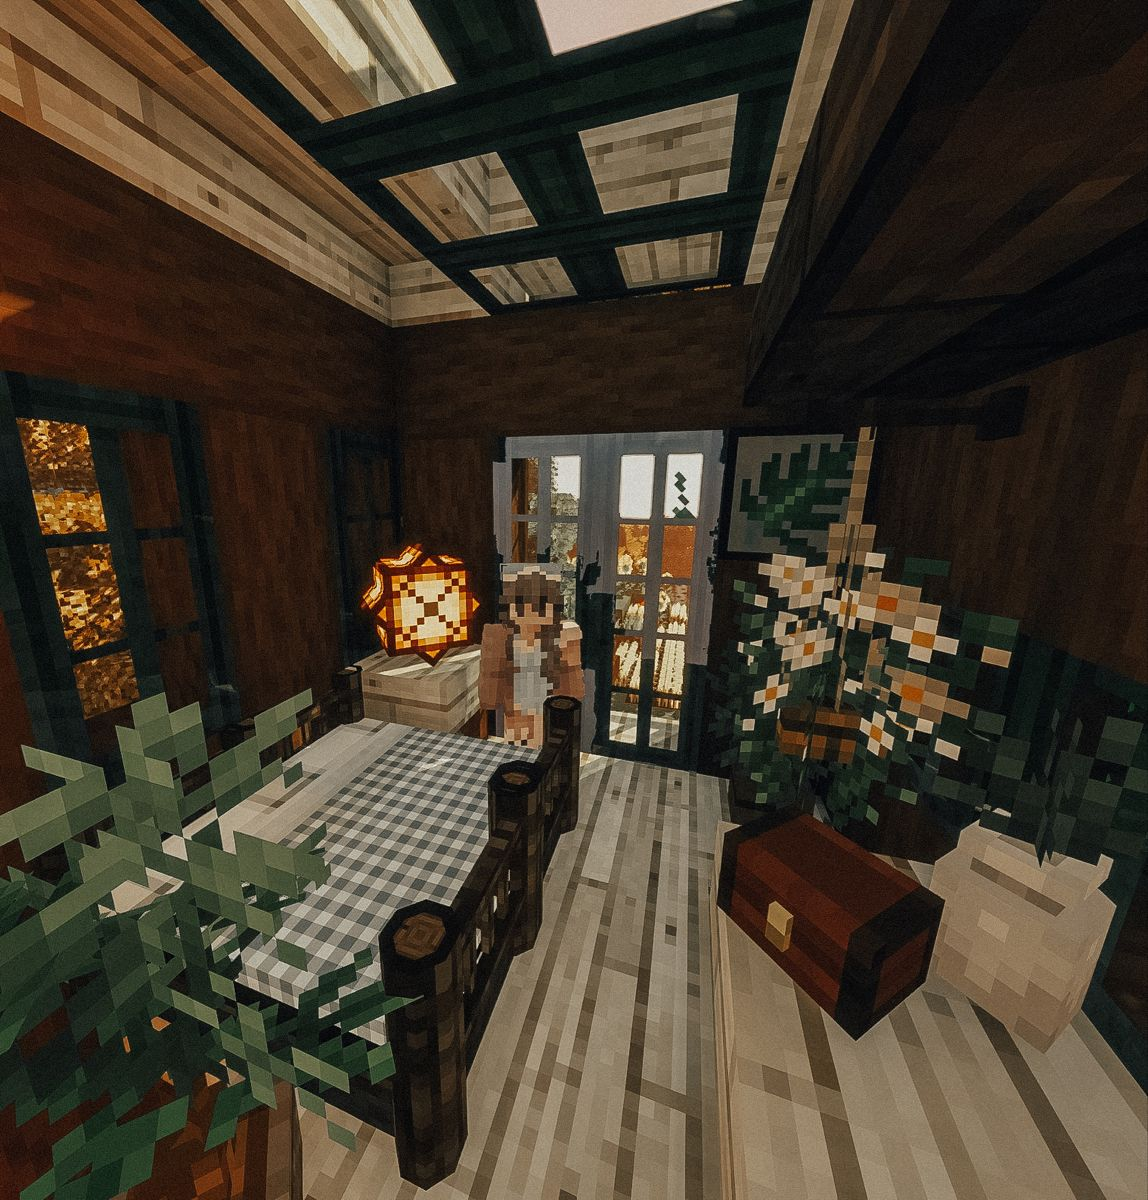 Tumblr Mopeyava In 2020 Minecraft Architecture Minecraft Cottage Cute Minecraft Houses